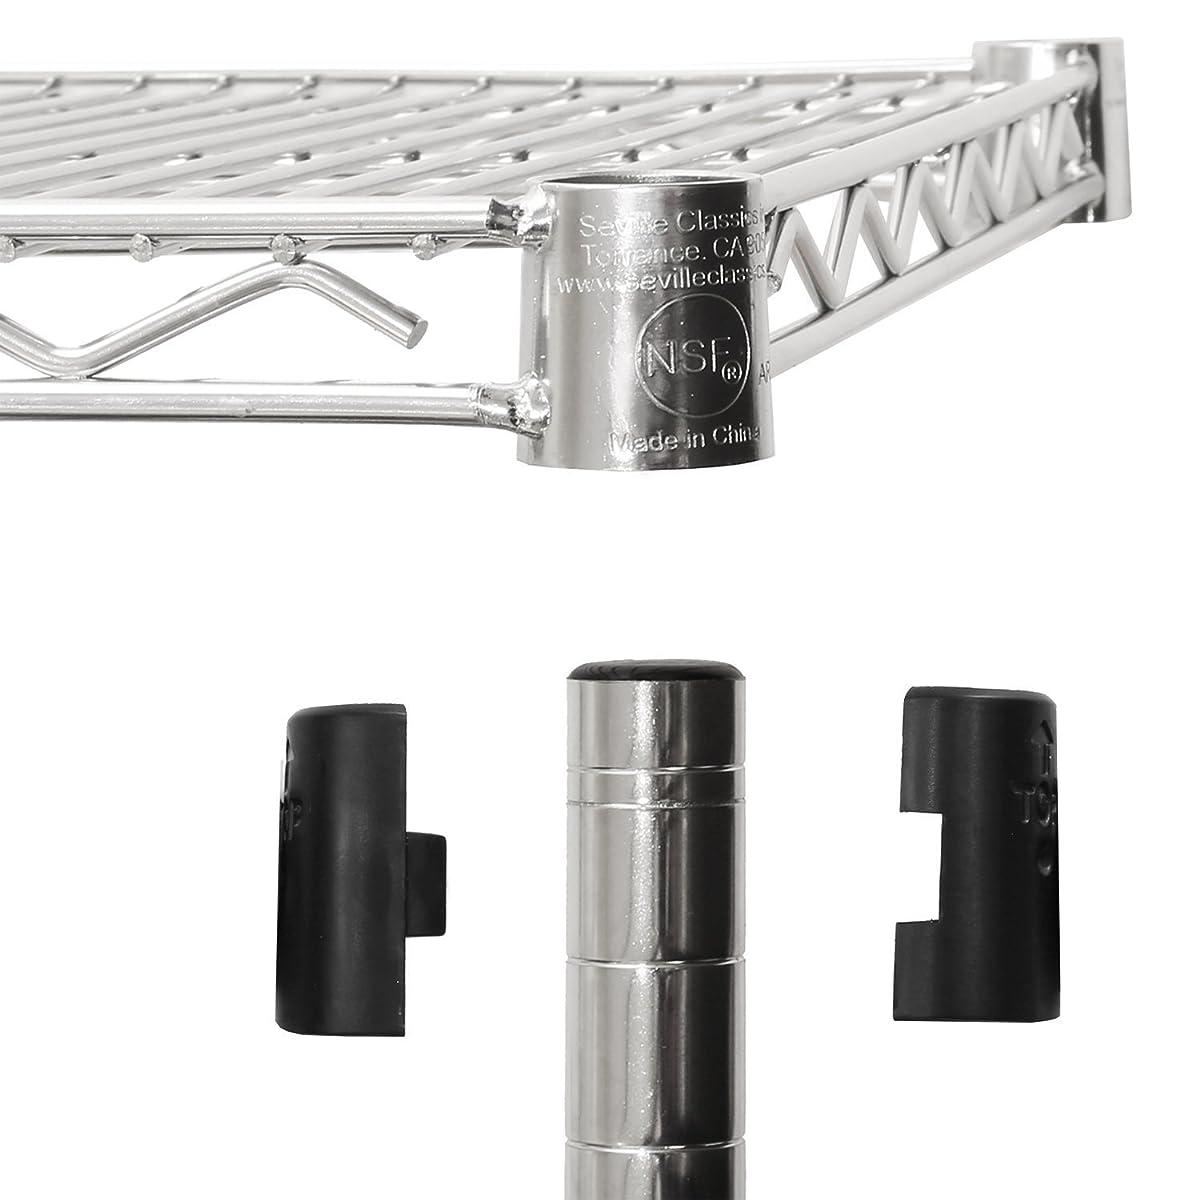 "Seville Classics UltraDurable 5-Tier NSF Steel Wire Shelving with Wheels 18"" D x 36"" W x 72"" H UltraZinc"